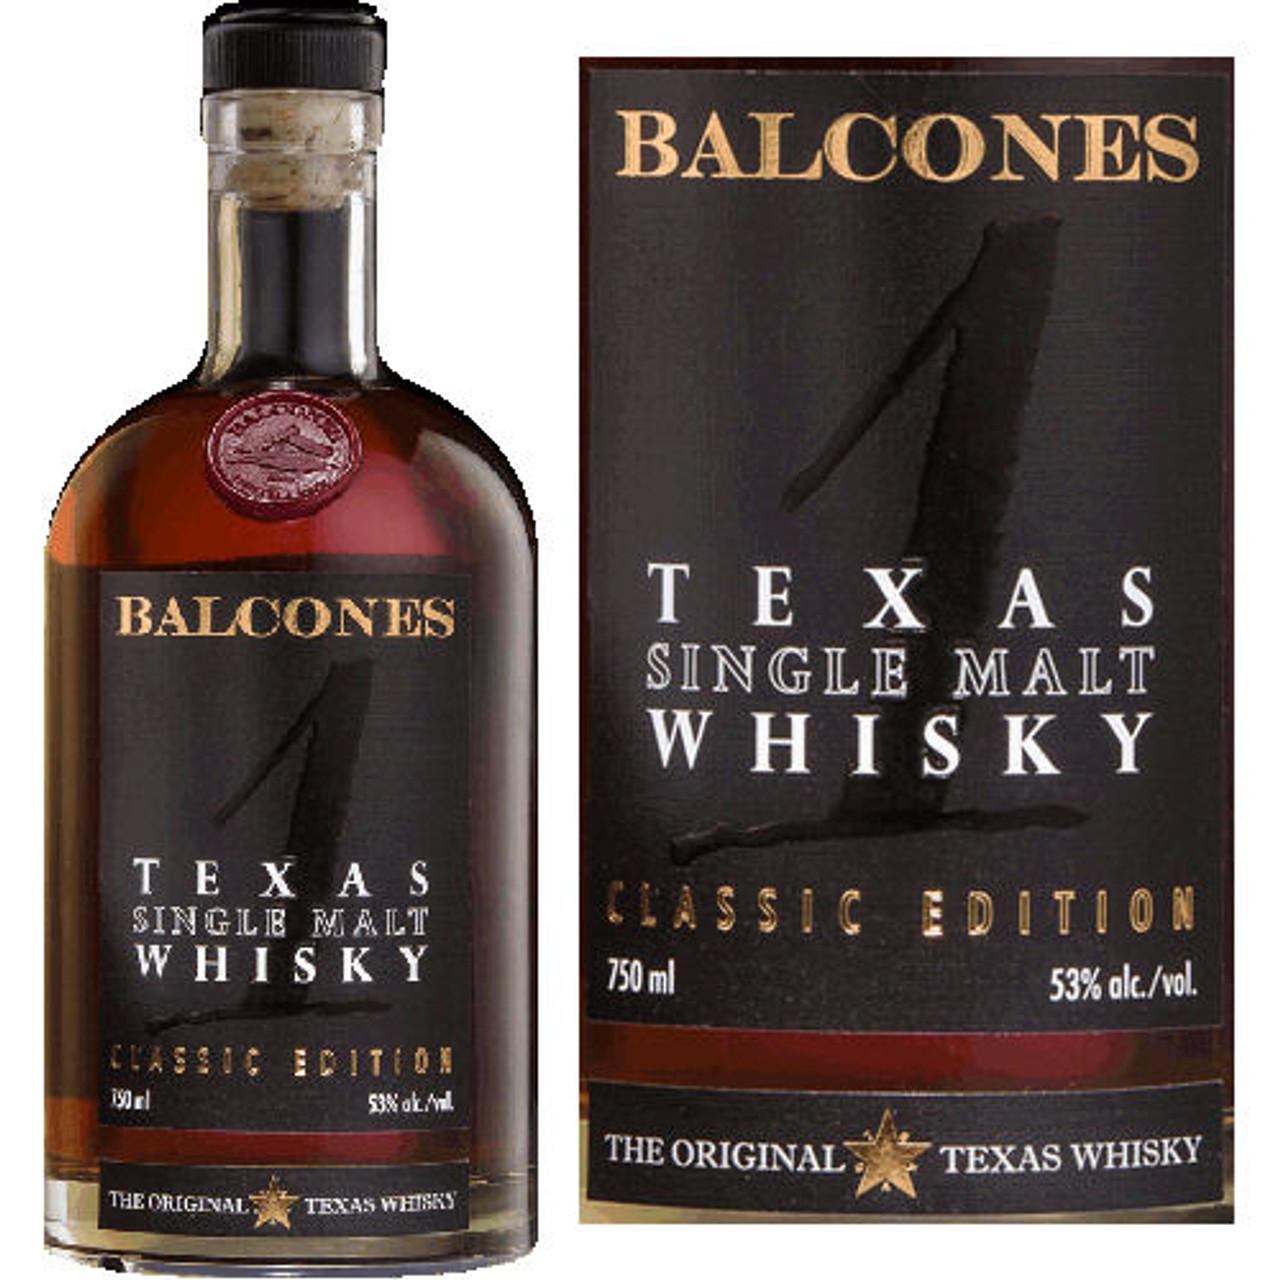 Balcones 1 Texas Single Malt Whisky 750ml